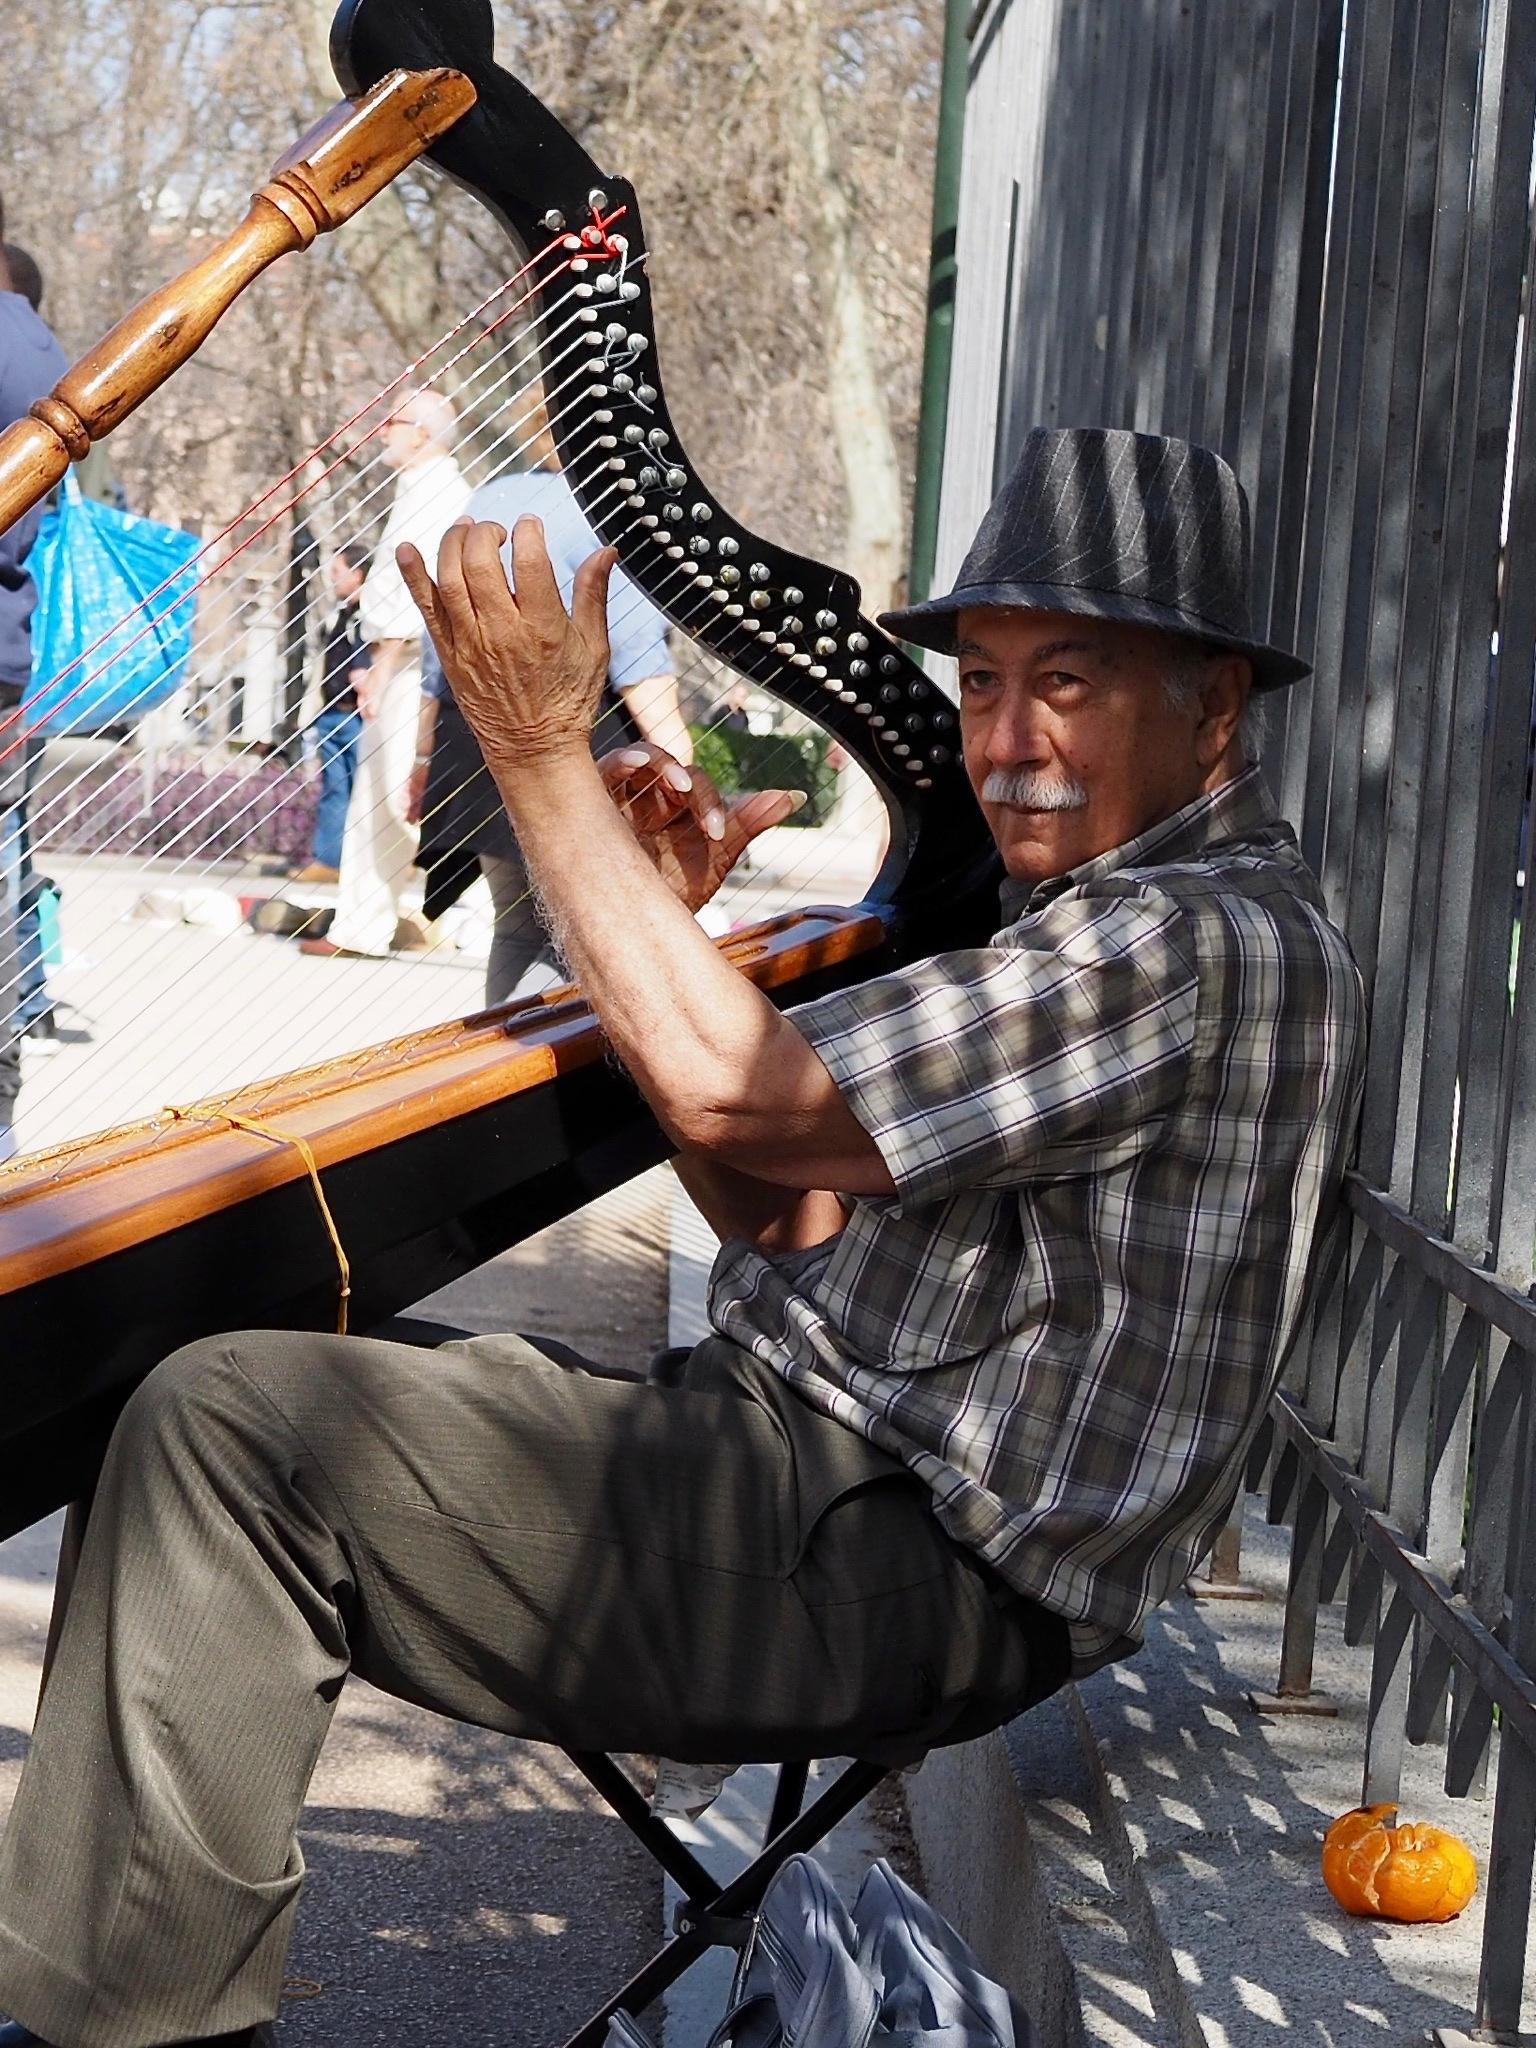 musician by Dietrik Vr